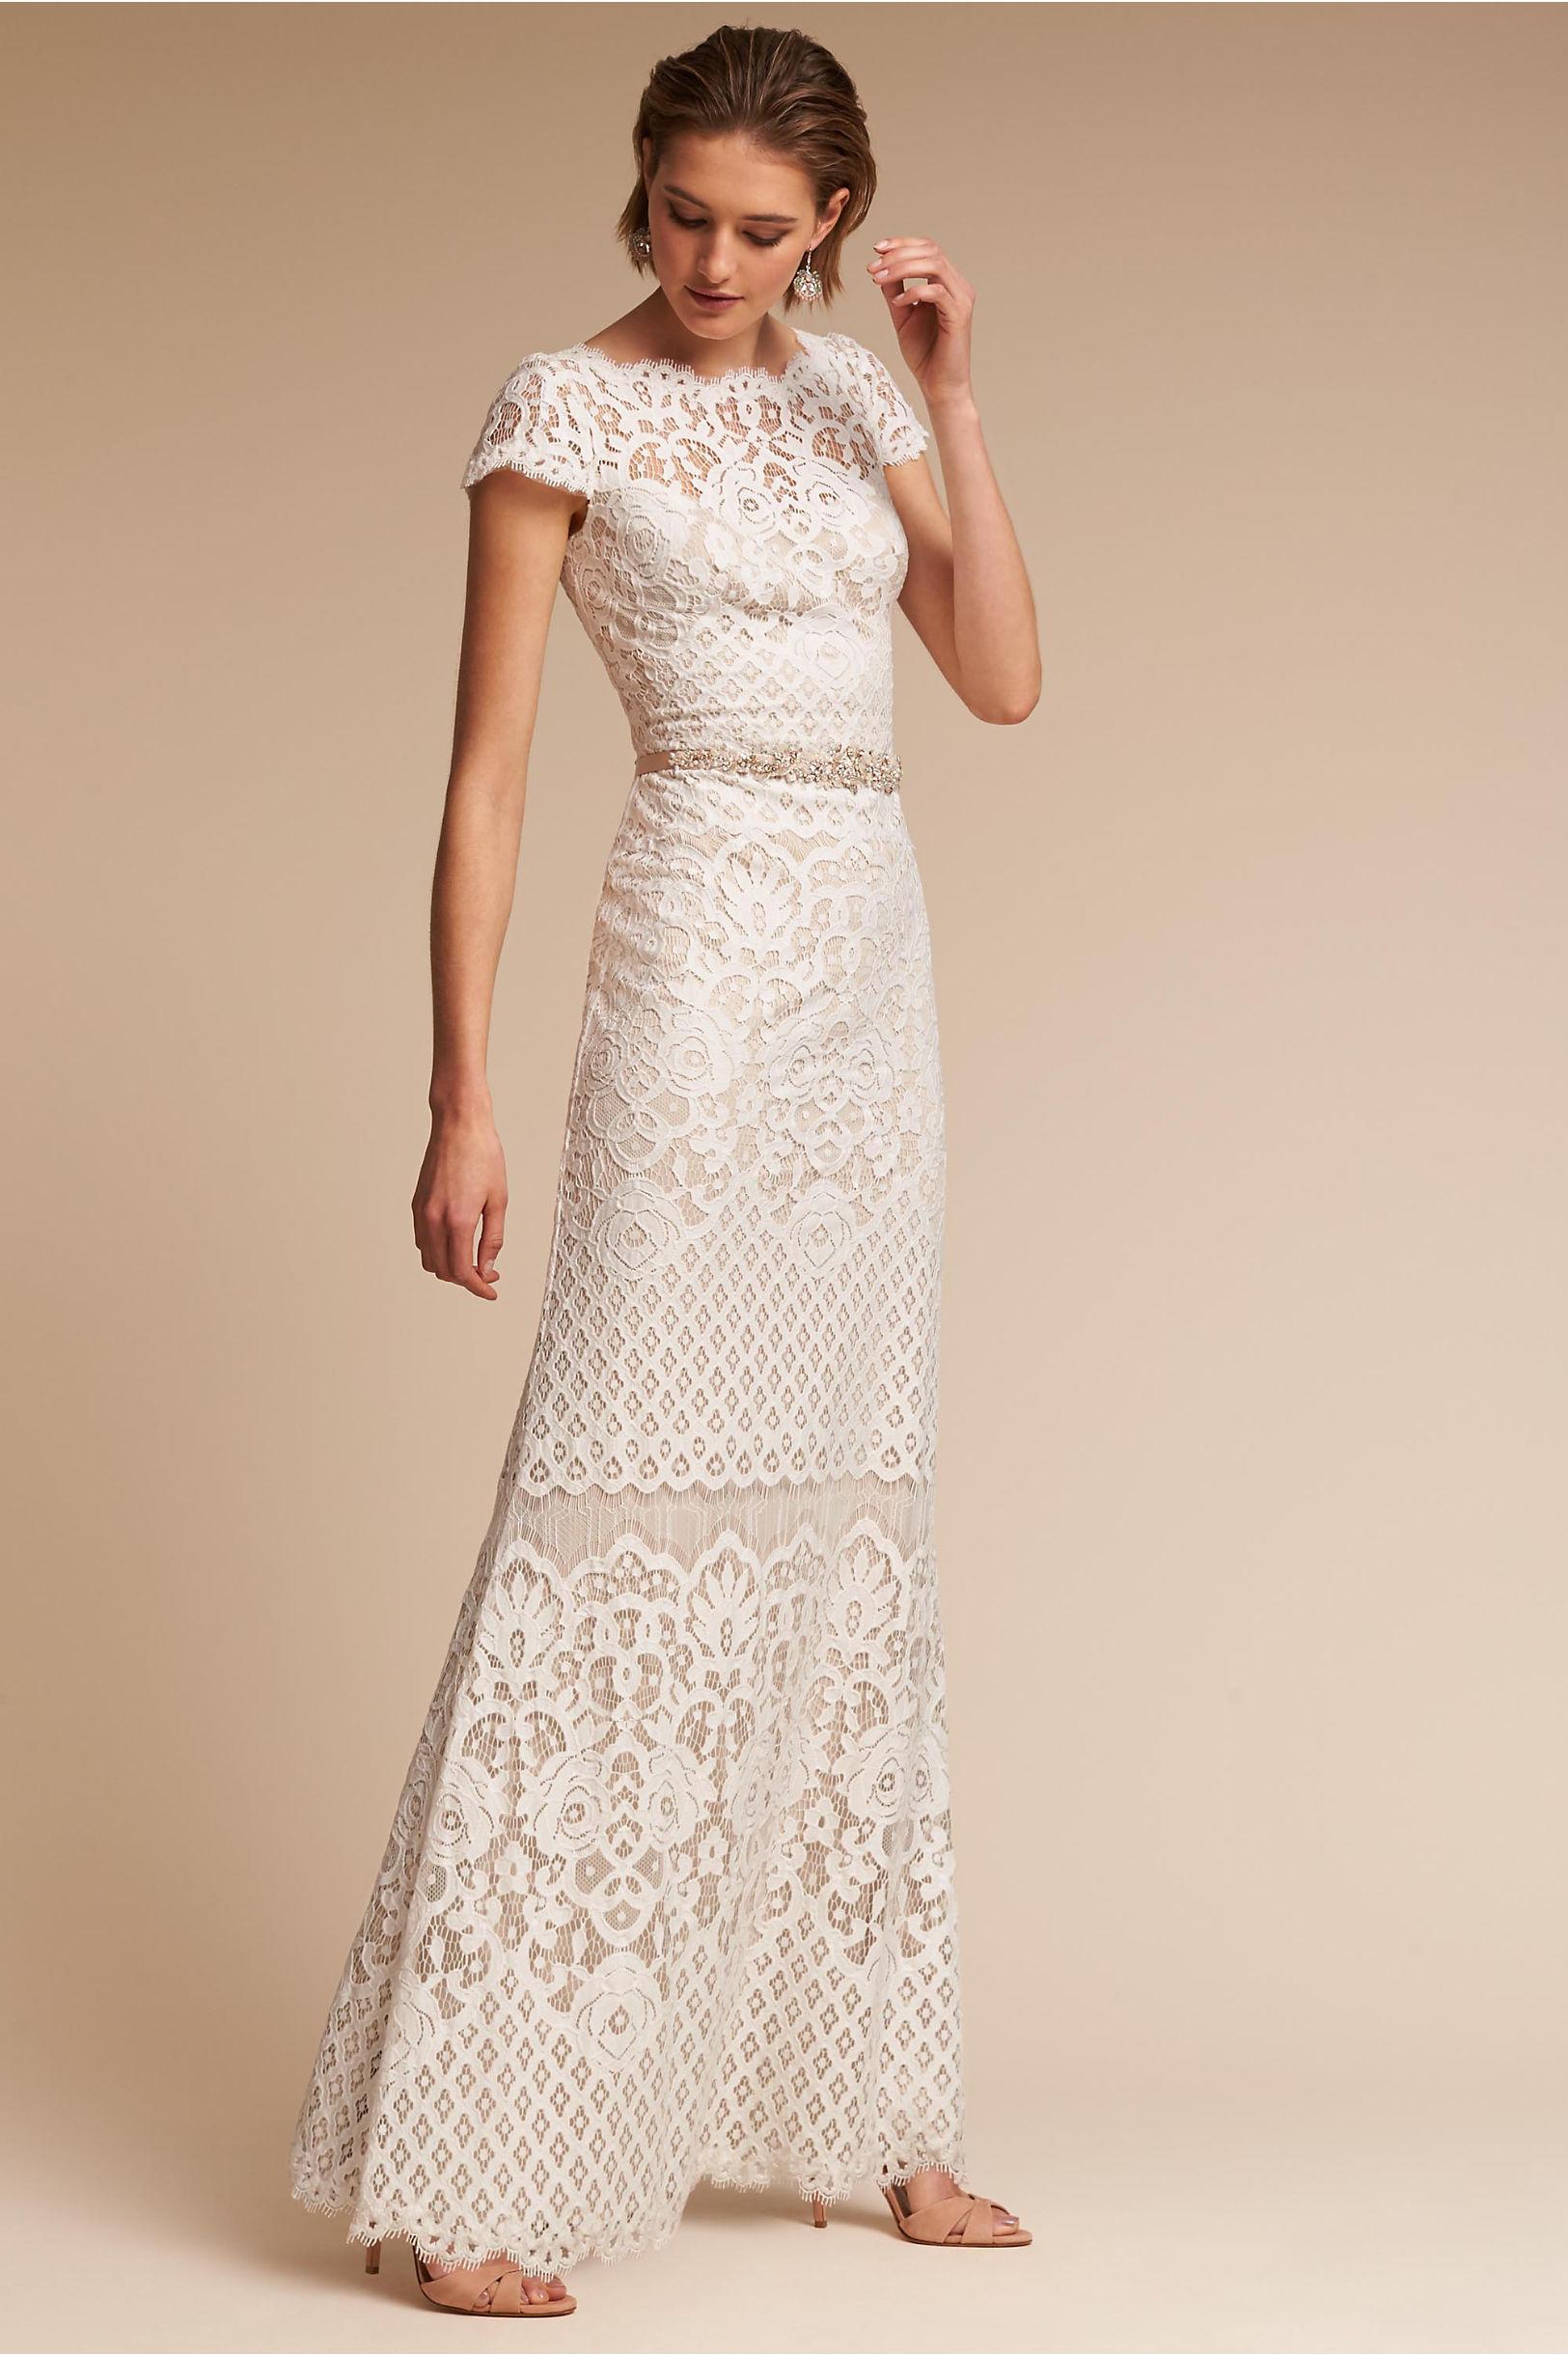 lace wedding dresses peridot gown peridot gown wuvjlxe